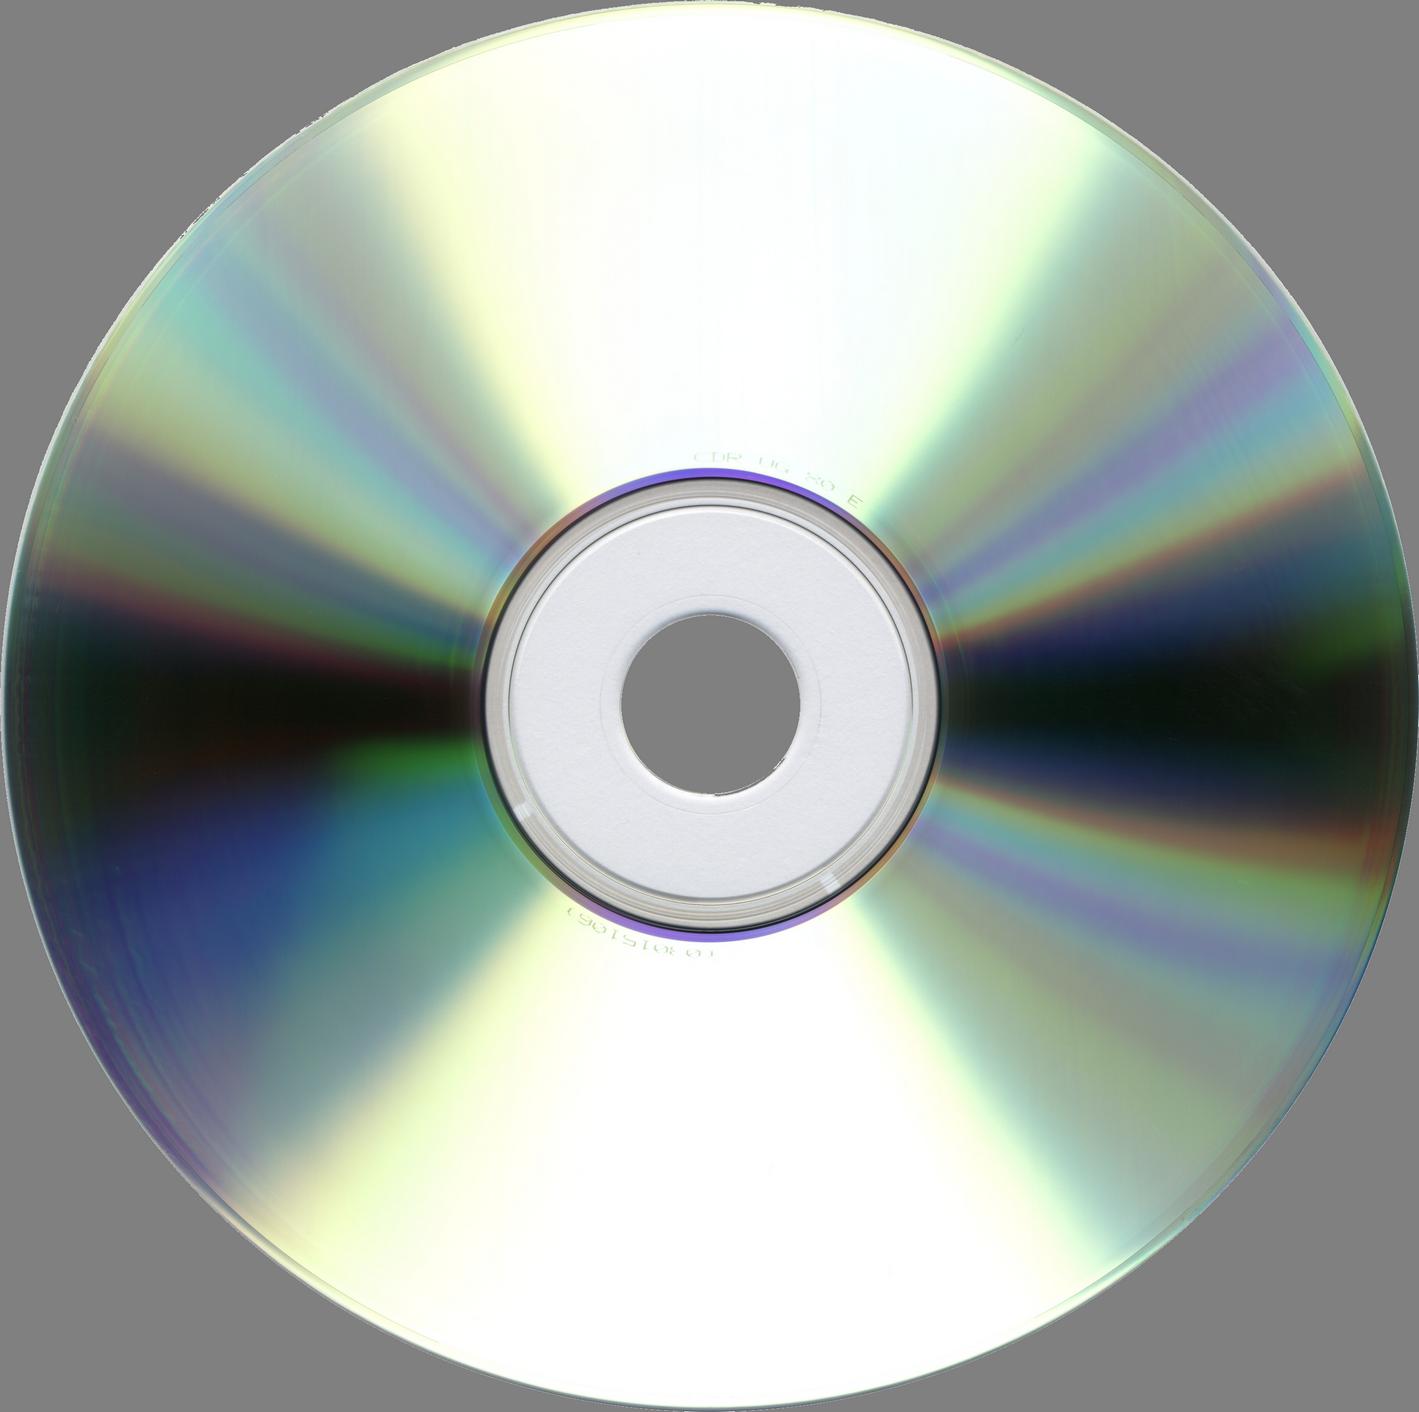 cd dvd png image purepng free transparent cc0 png image library. Black Bedroom Furniture Sets. Home Design Ideas